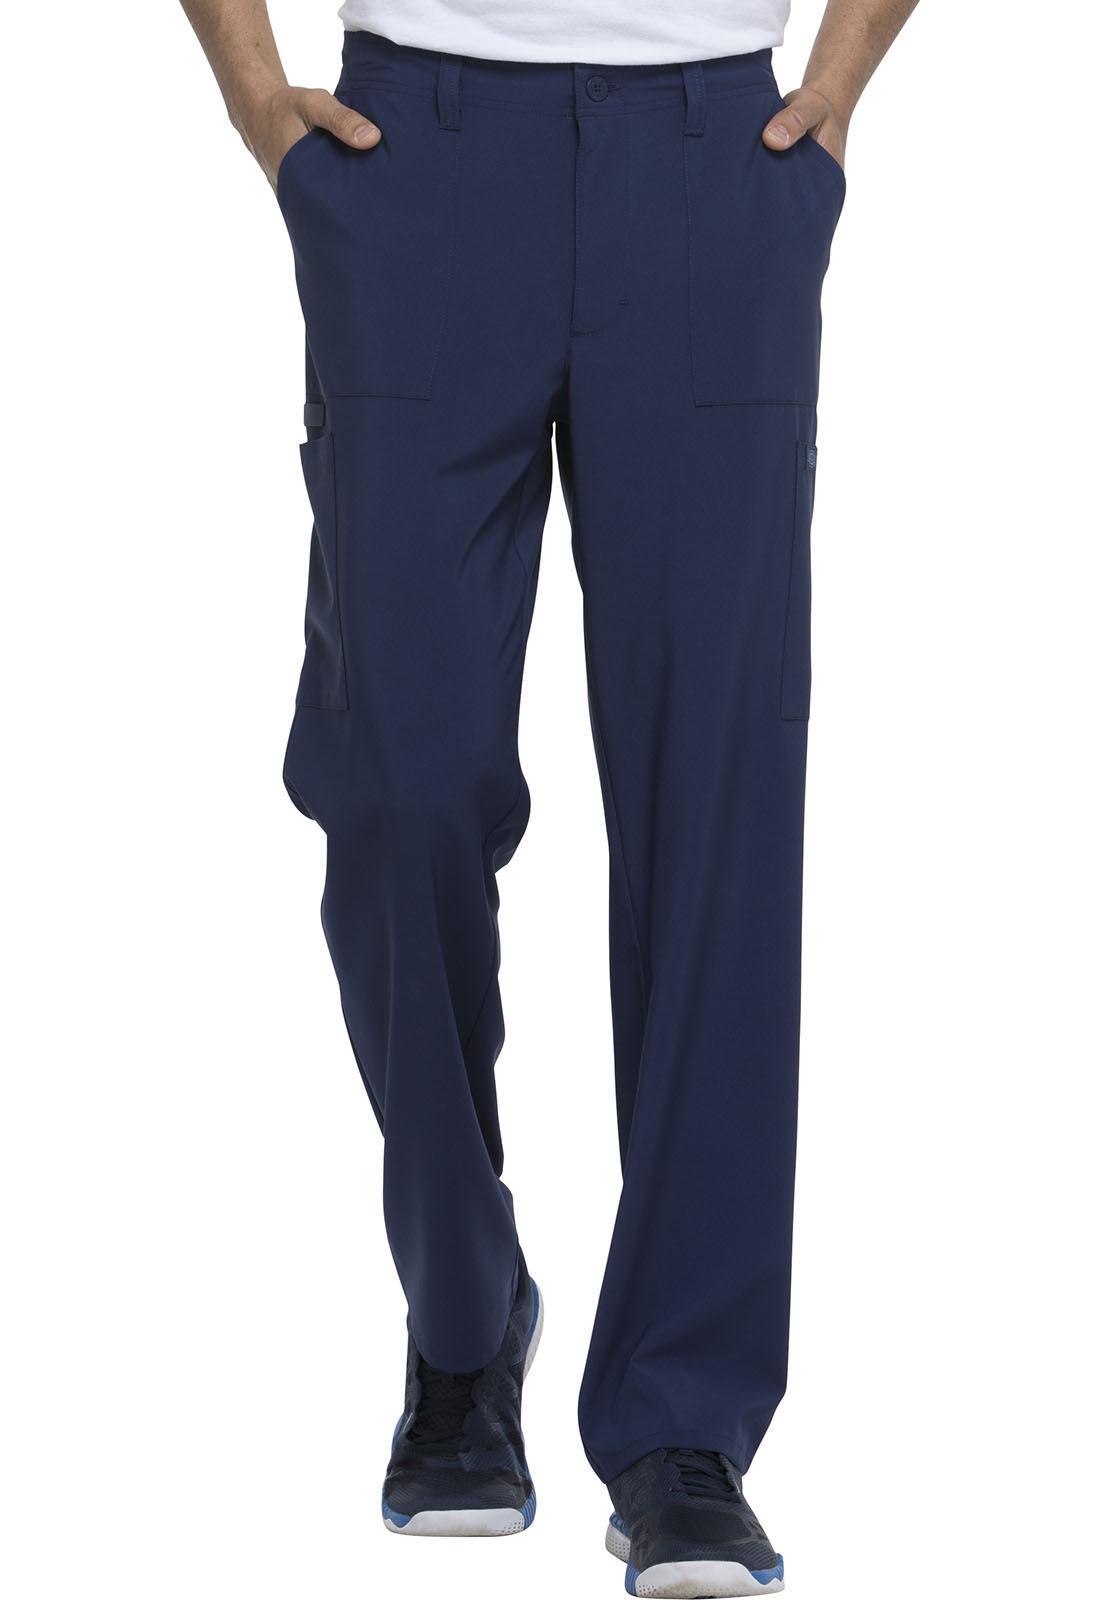 a225a9fad30 EDS Essentials Men's Natural Rise Drawstring Pant in Navy DK015S ...